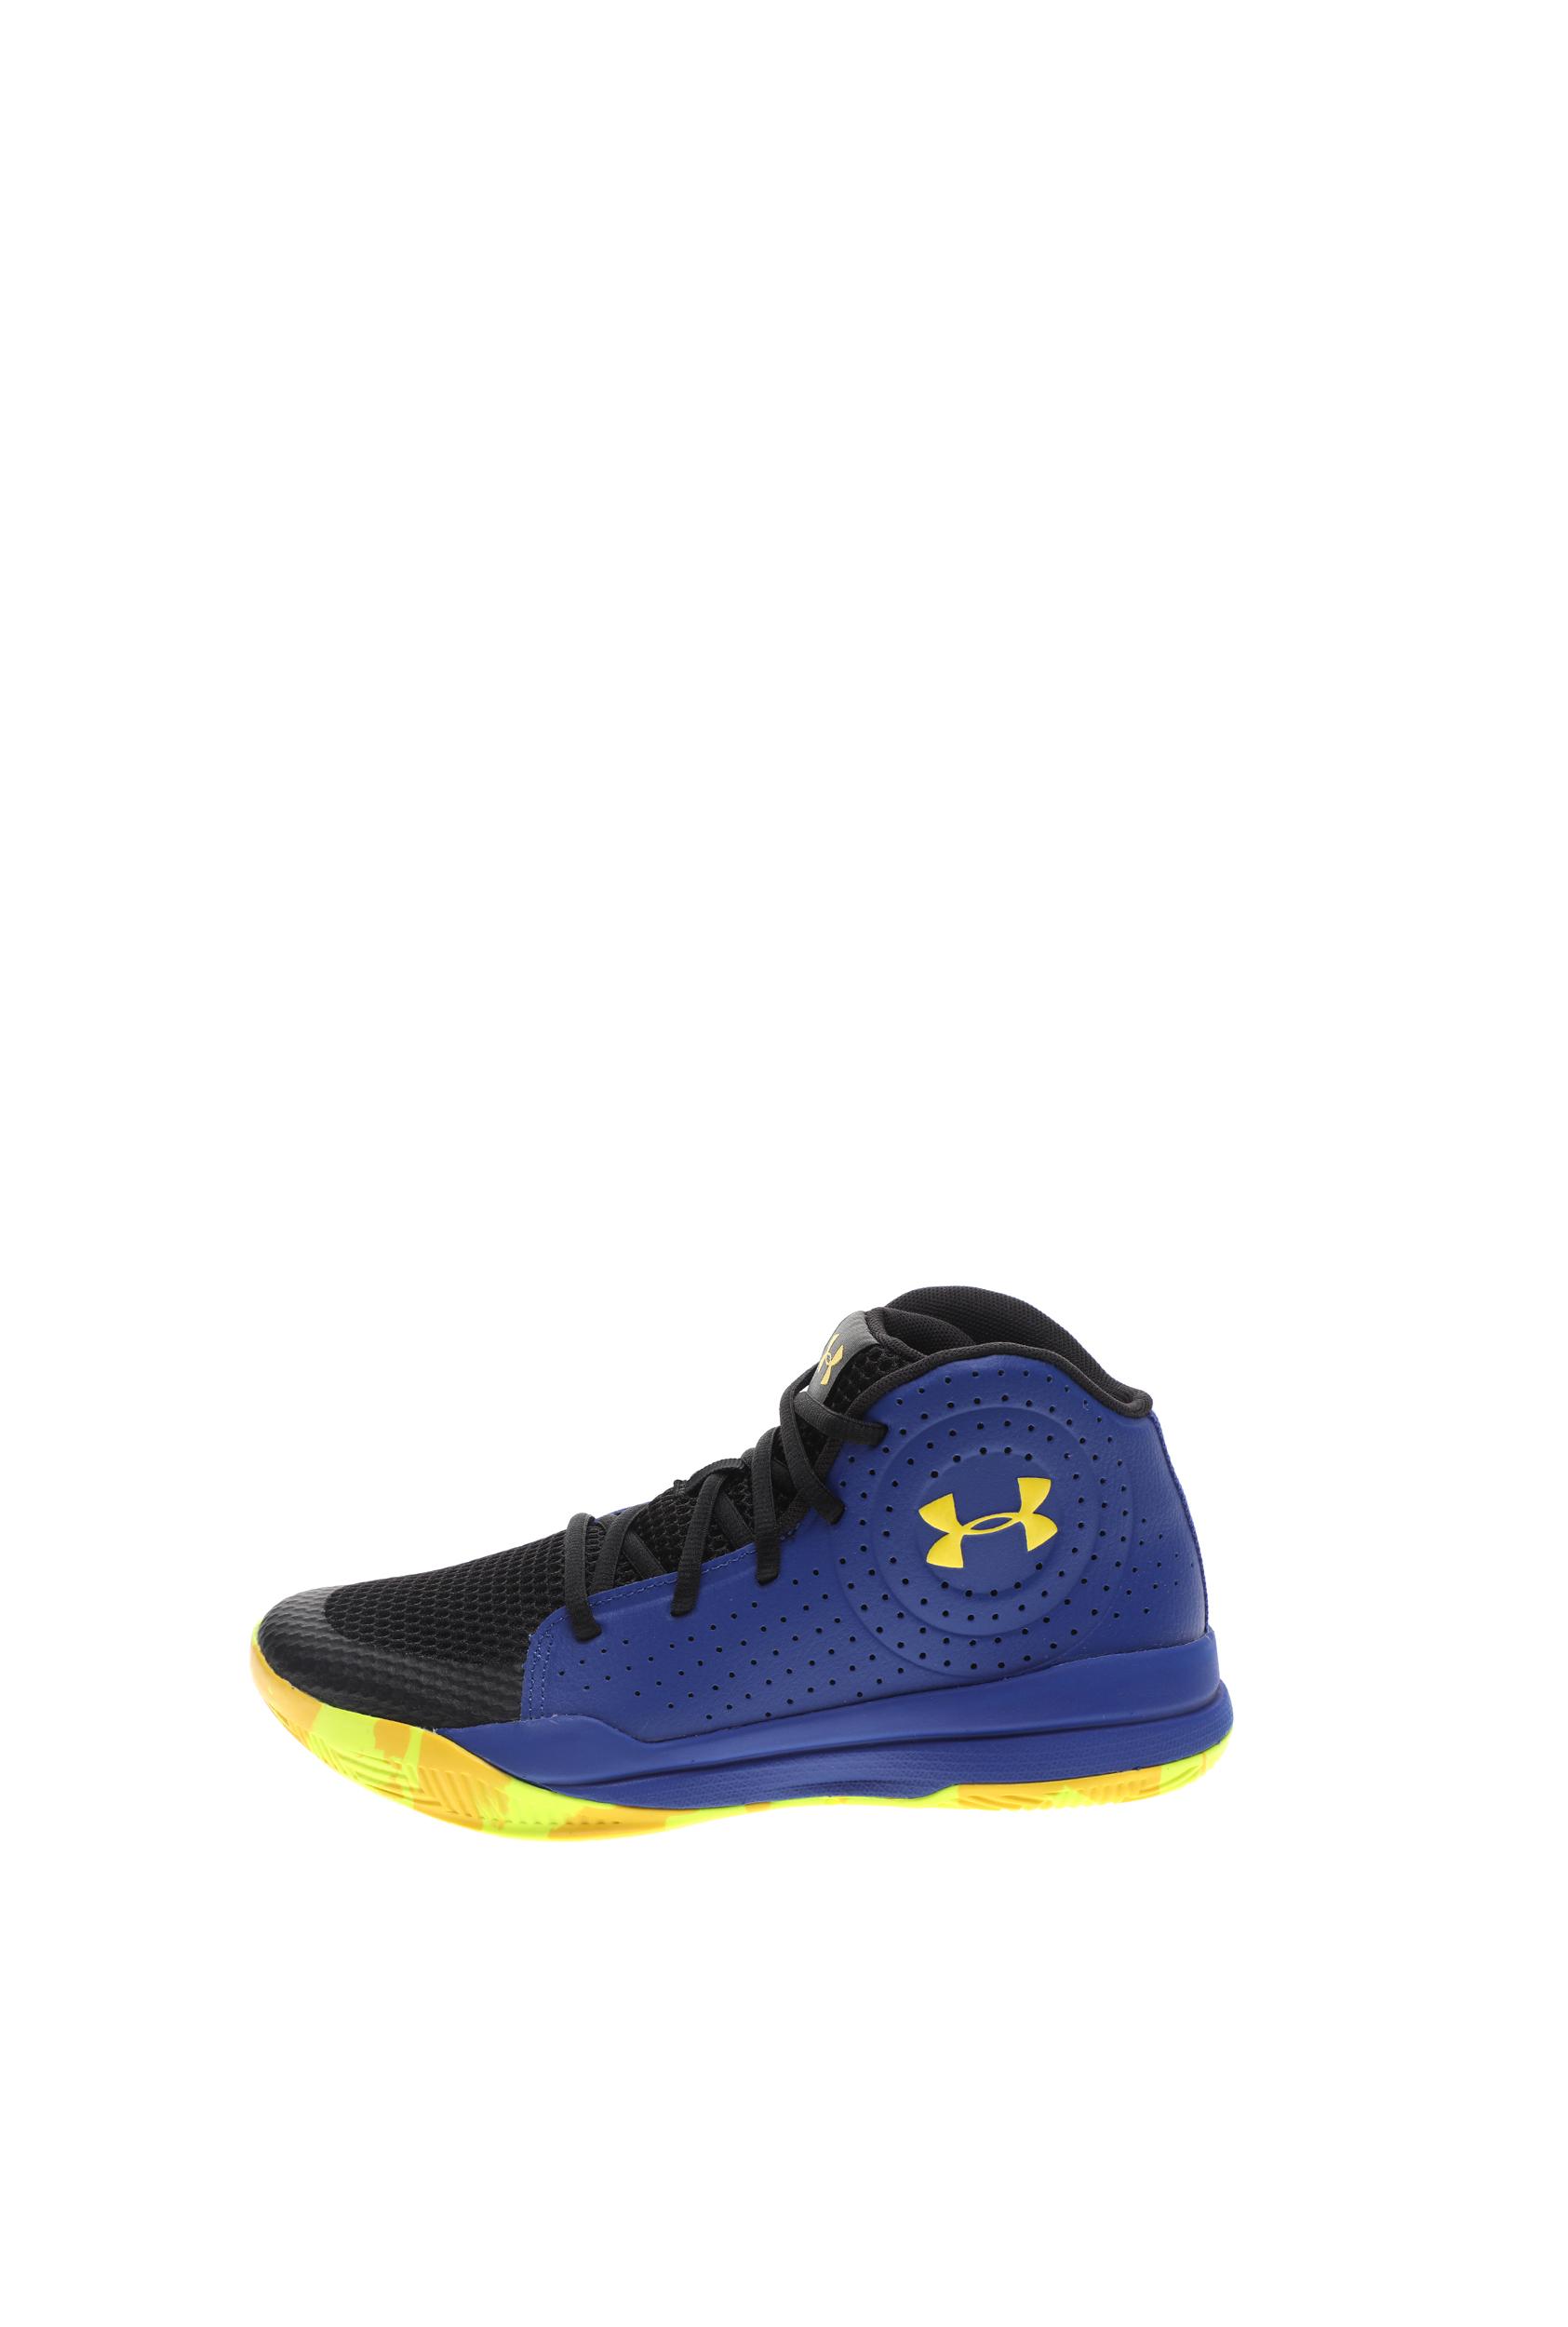 UNDER ARMOUR – Παιδικά παπούτσια basketball UNDER ARMOUR GS Jet 2019 μπλε κίτρινα